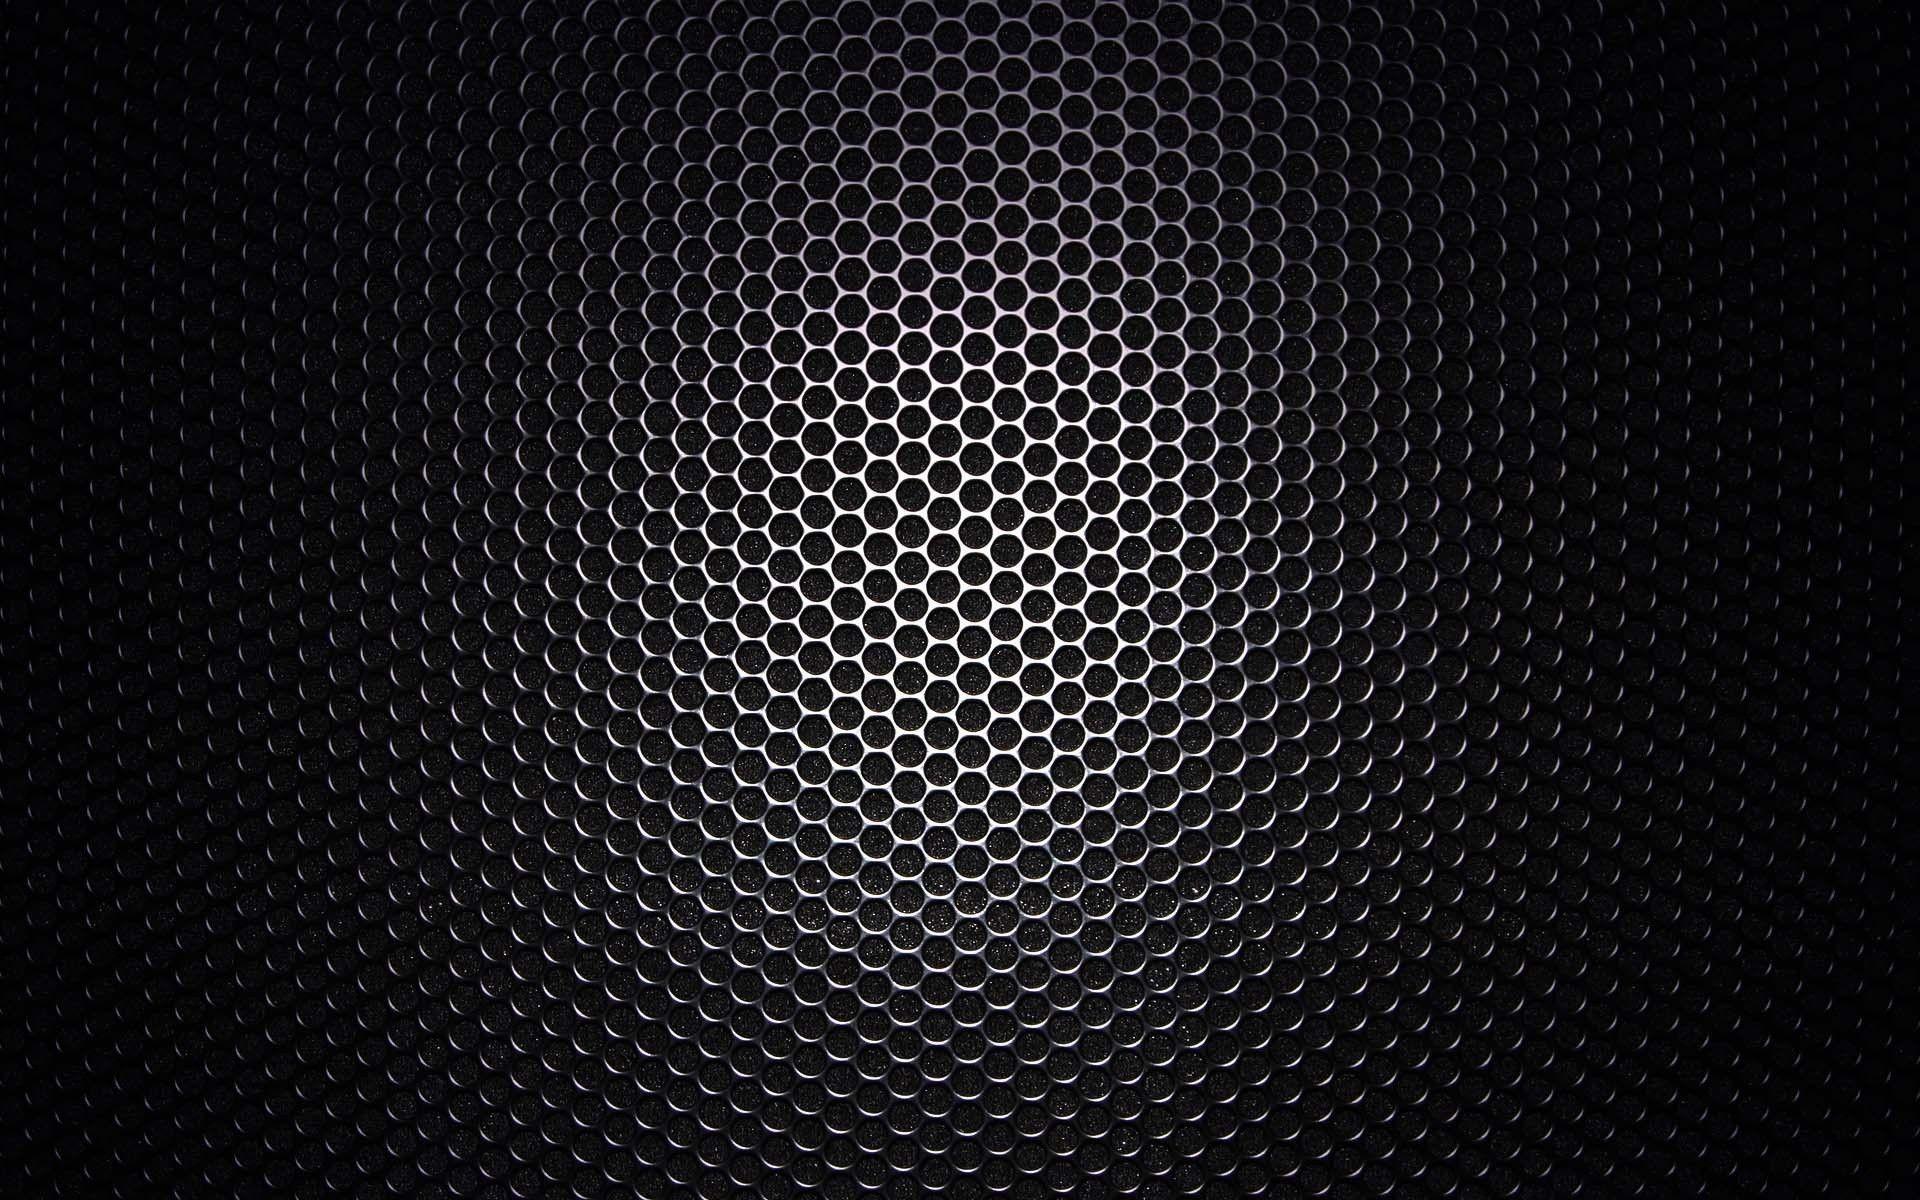 Hd Metal Wallpapers Metallic Backgrounds For Free Desktop Download Full Black Wallpaper Black Wallpaper Black Background Wallpaper